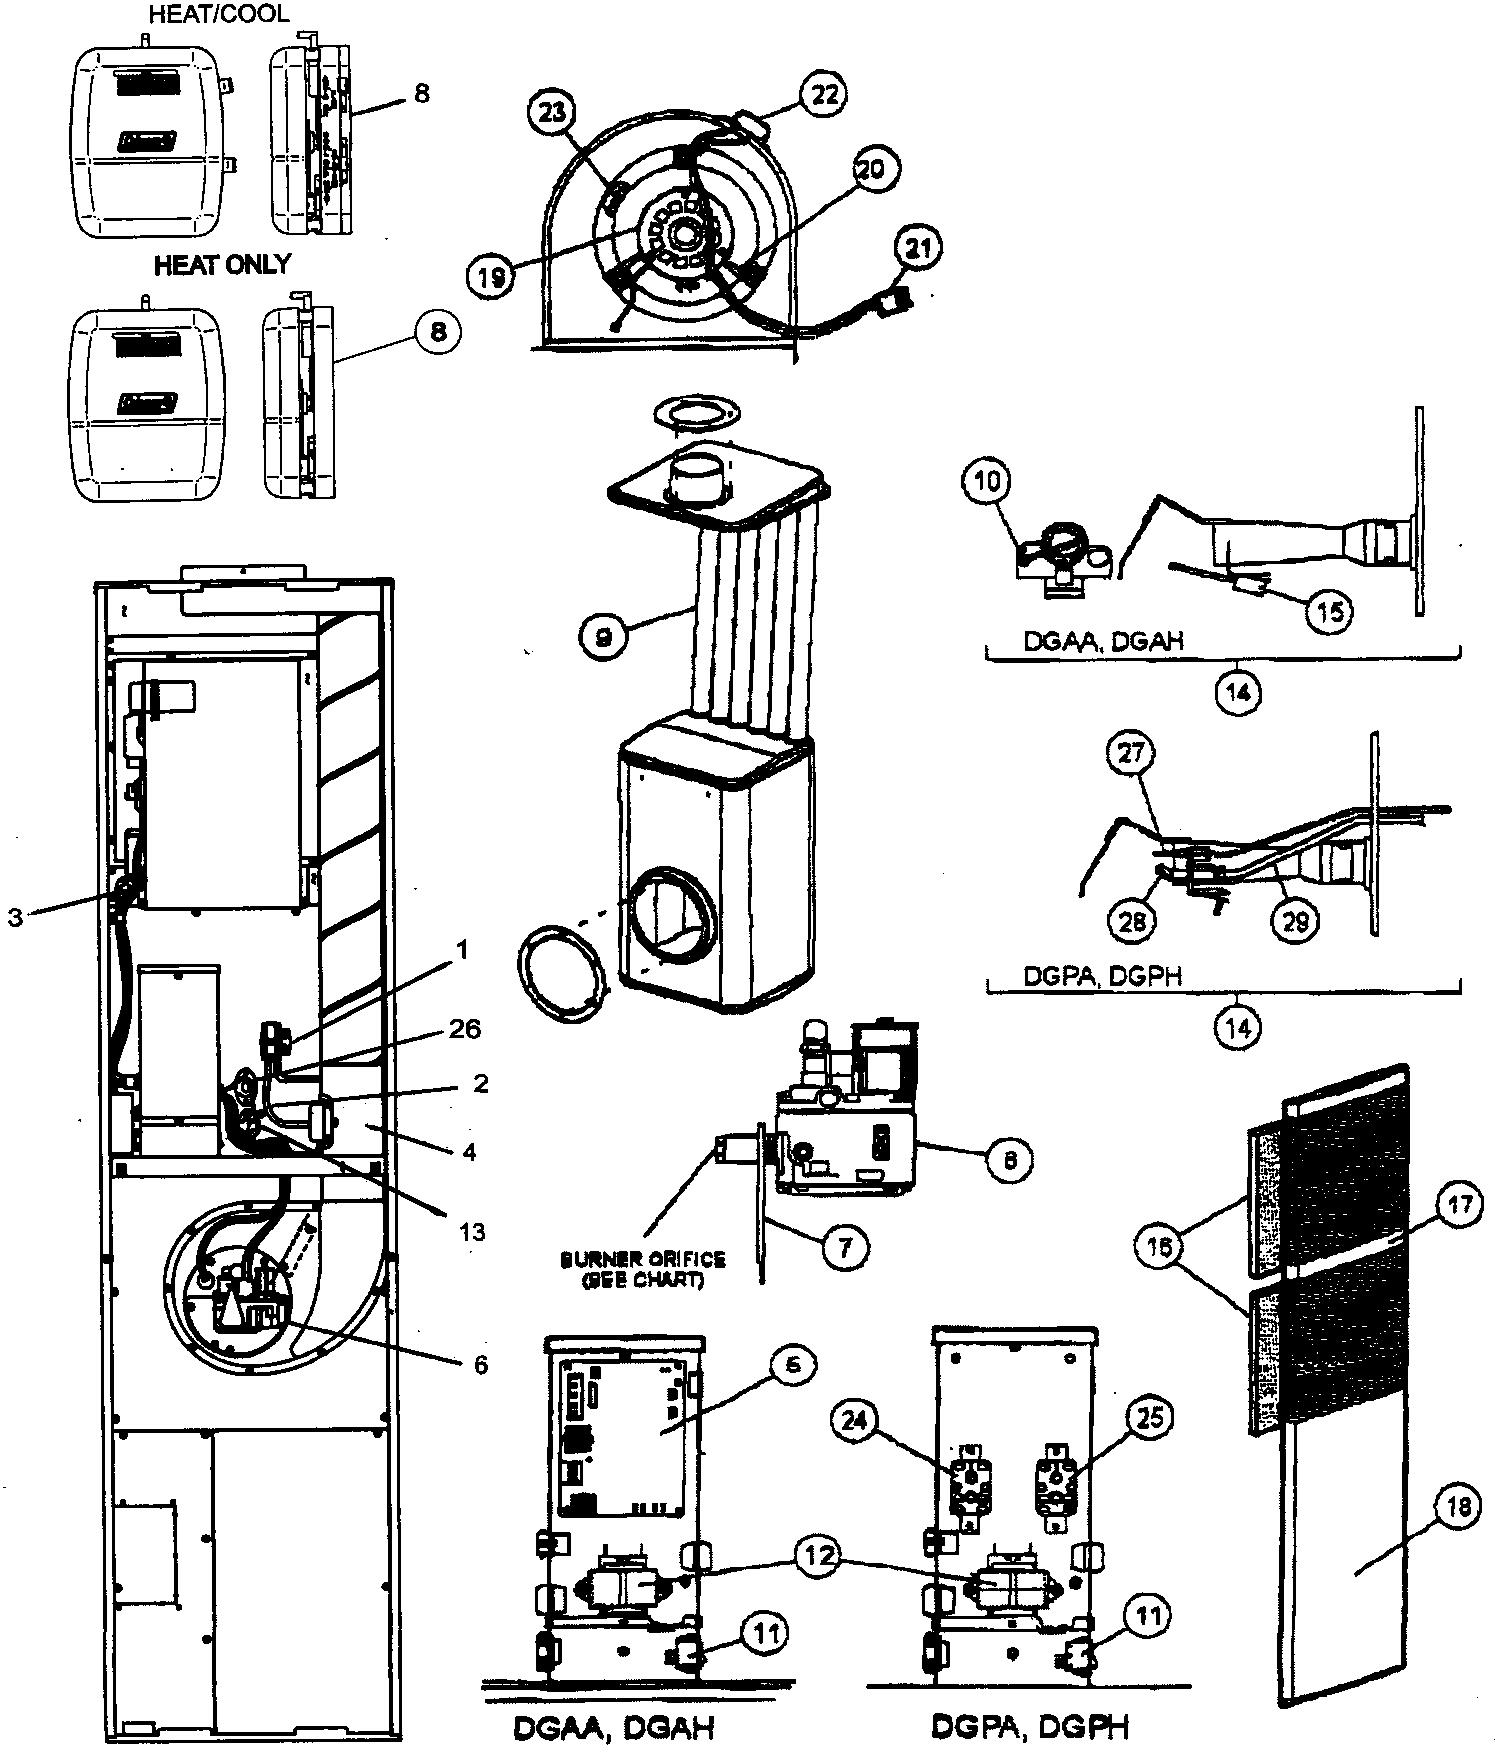 medium resolution of coleman furnace manual